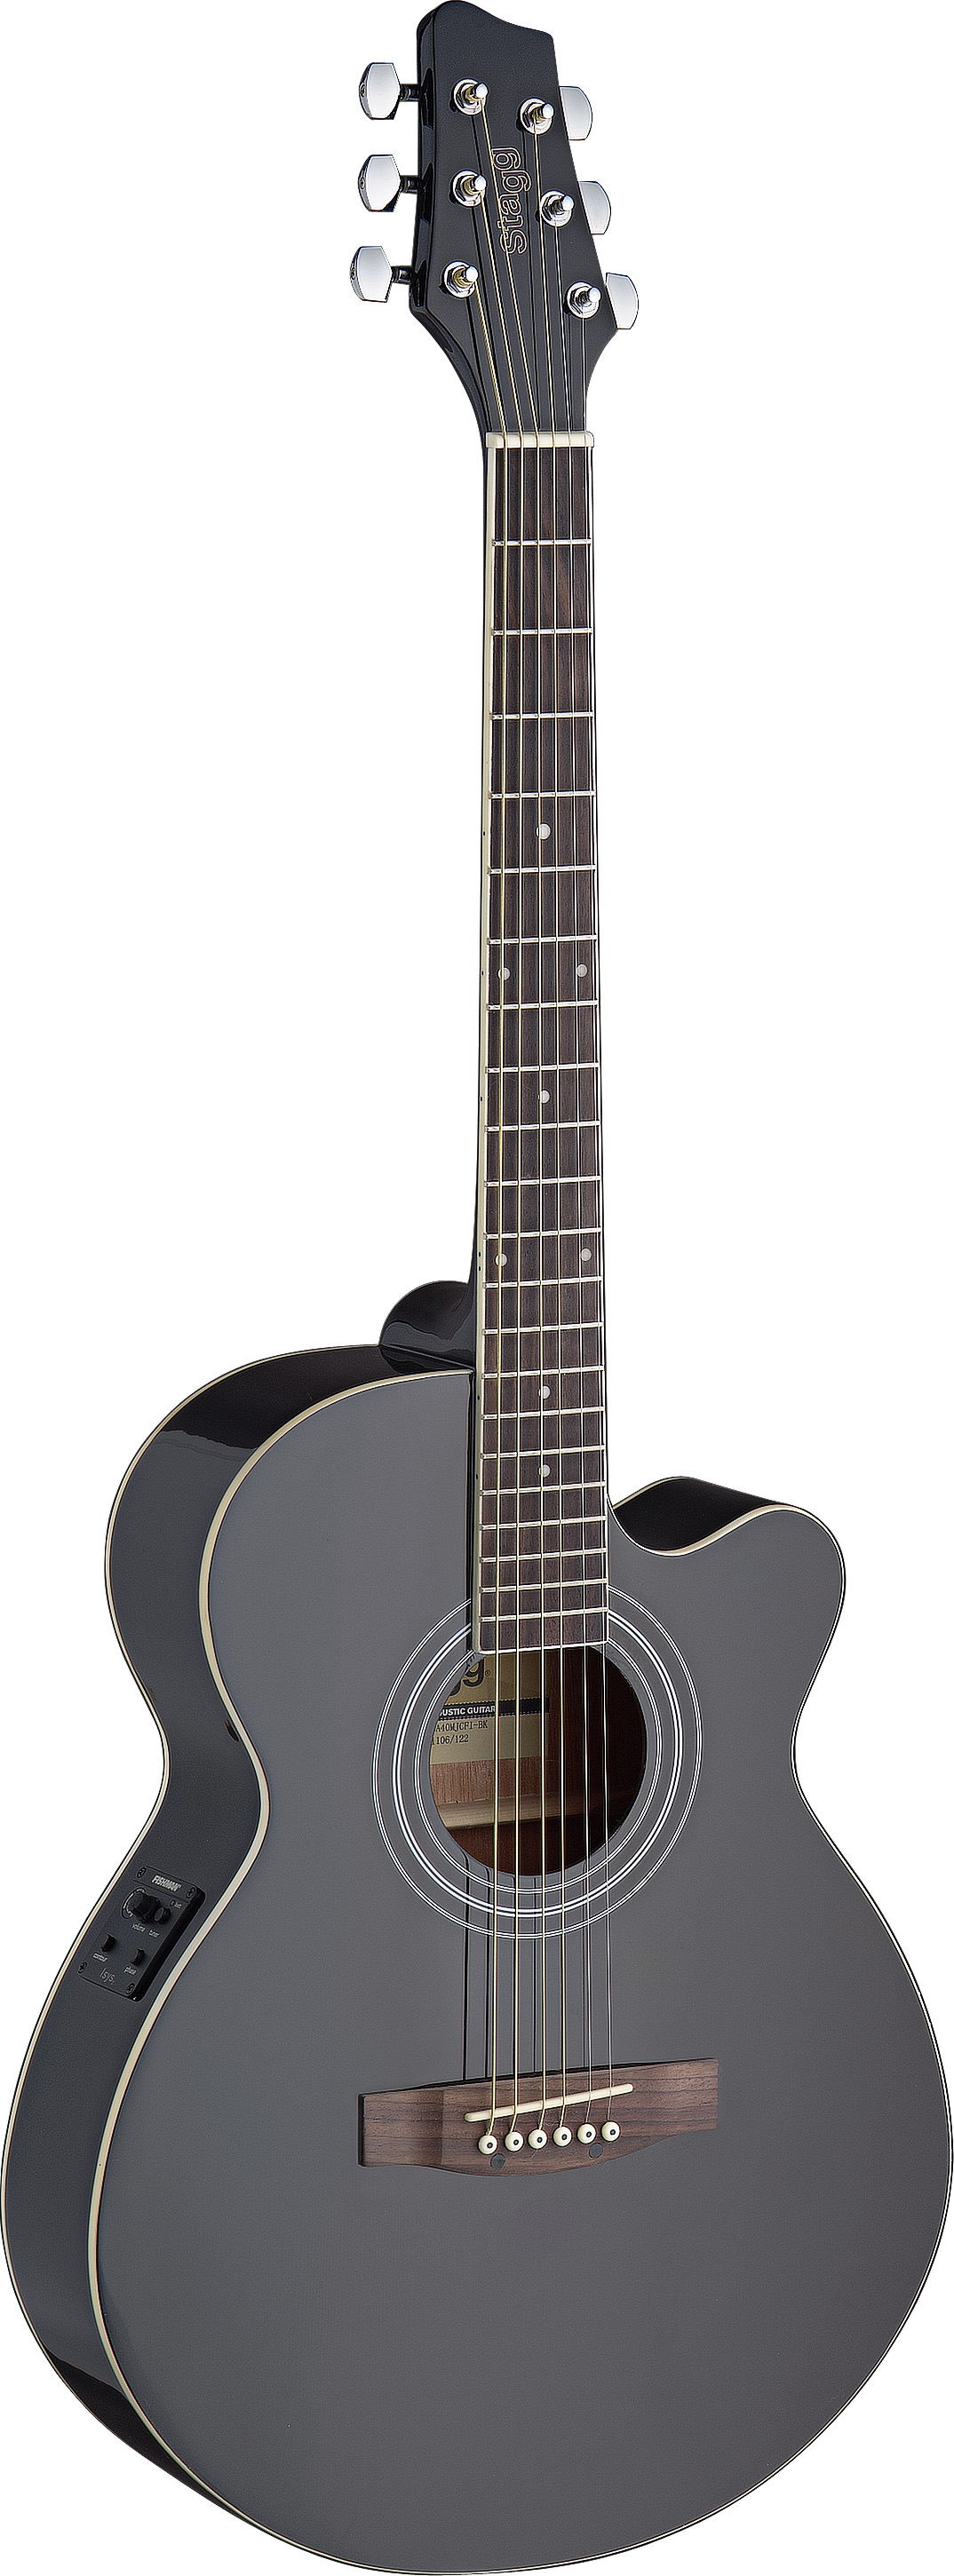 Stagg SA40MJCFI-BK, elektroakustická kytara typu Mini Jumbo, černá